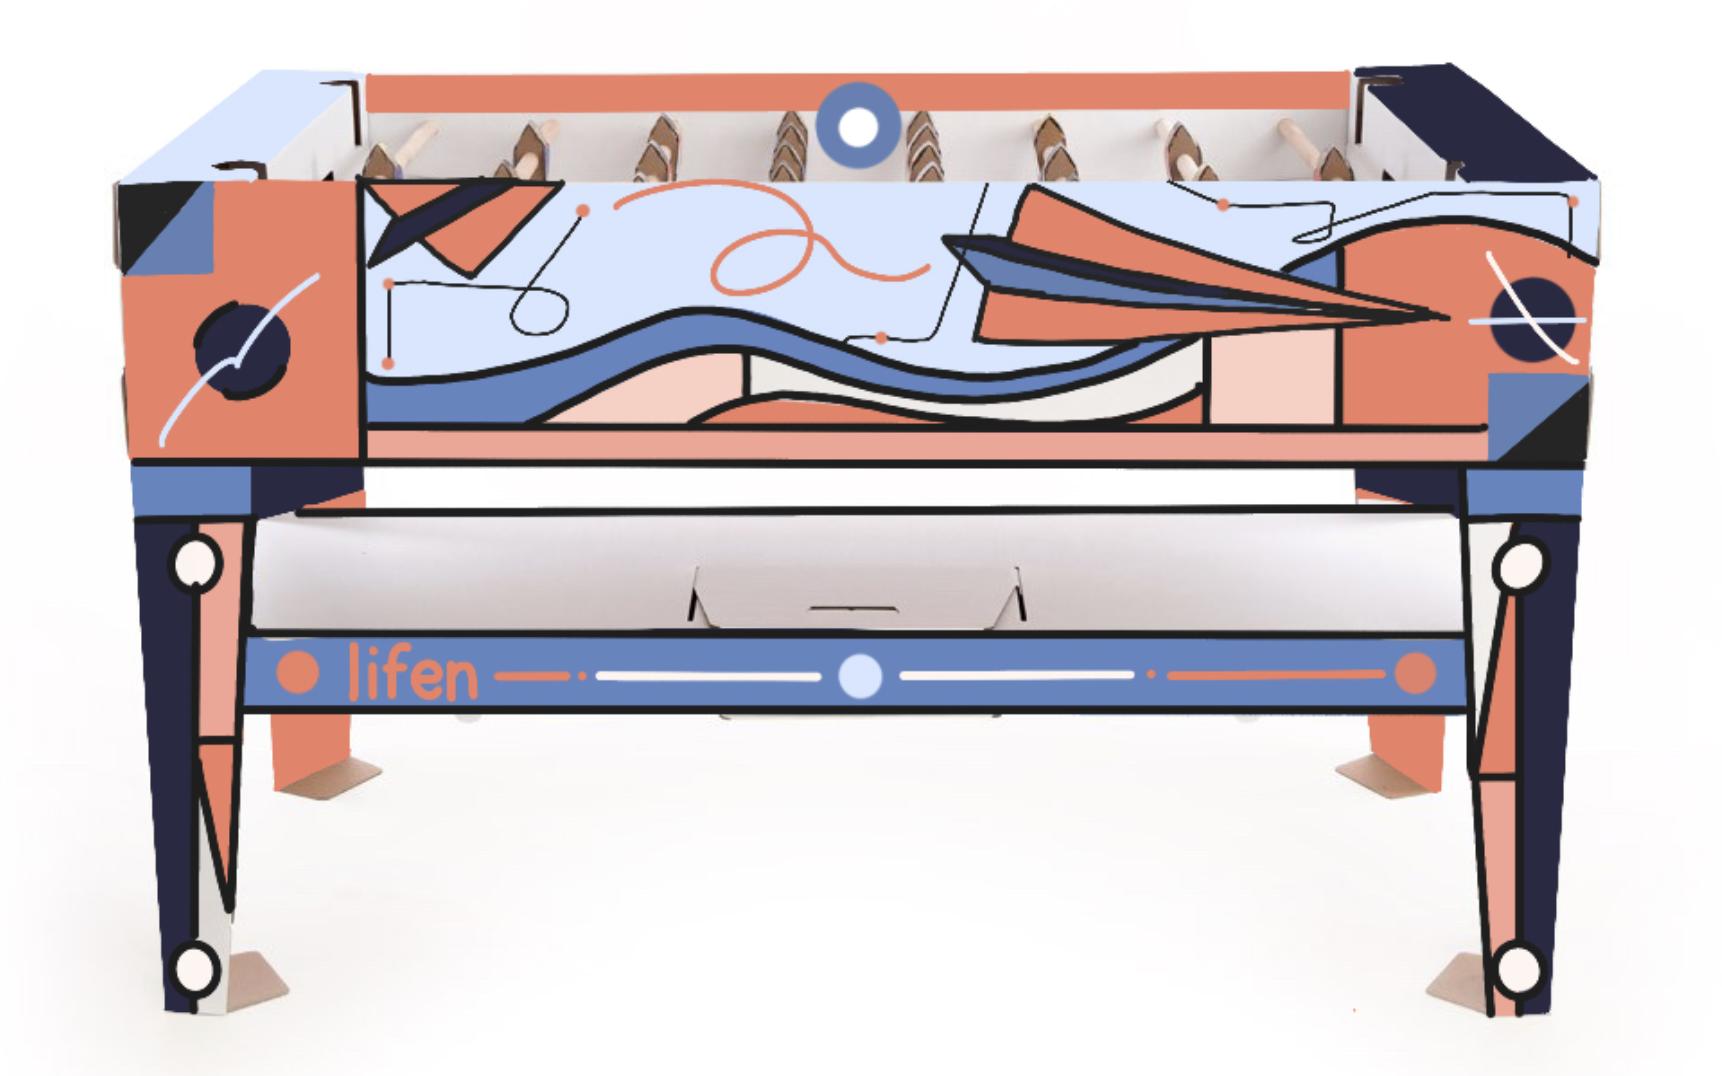 Baby foot en carton personnalisé par un graffeur